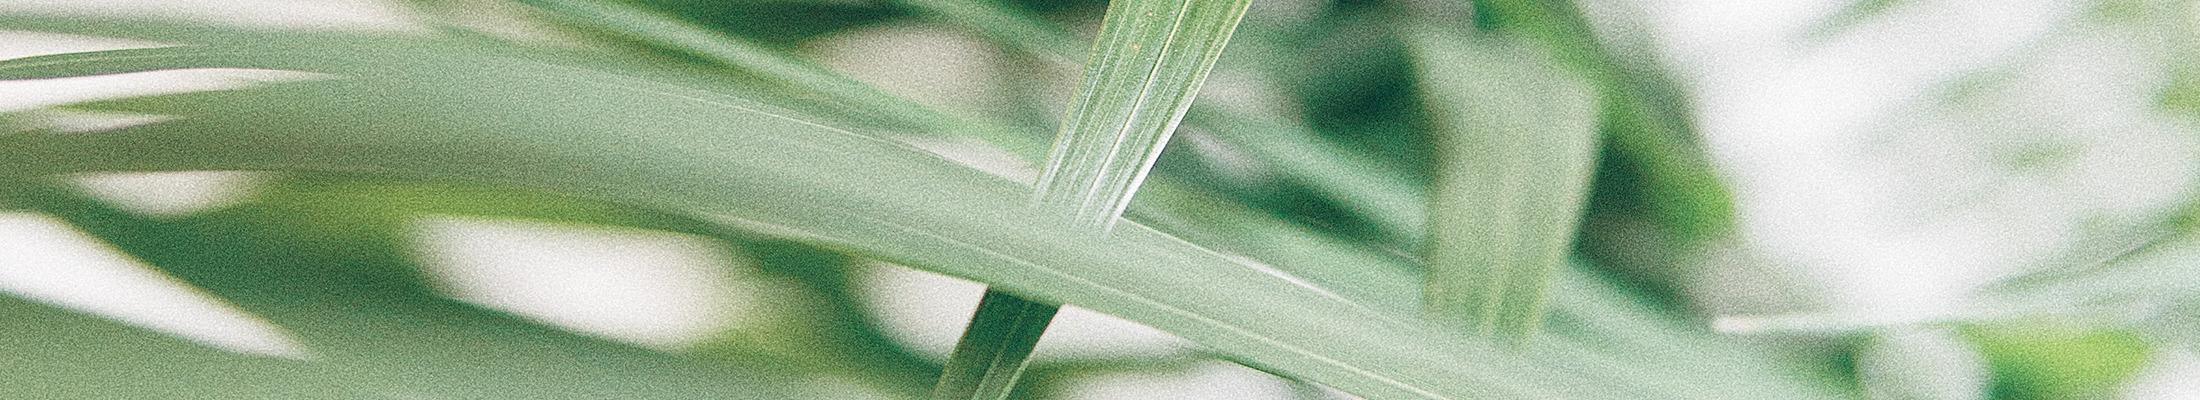 Groene stengels